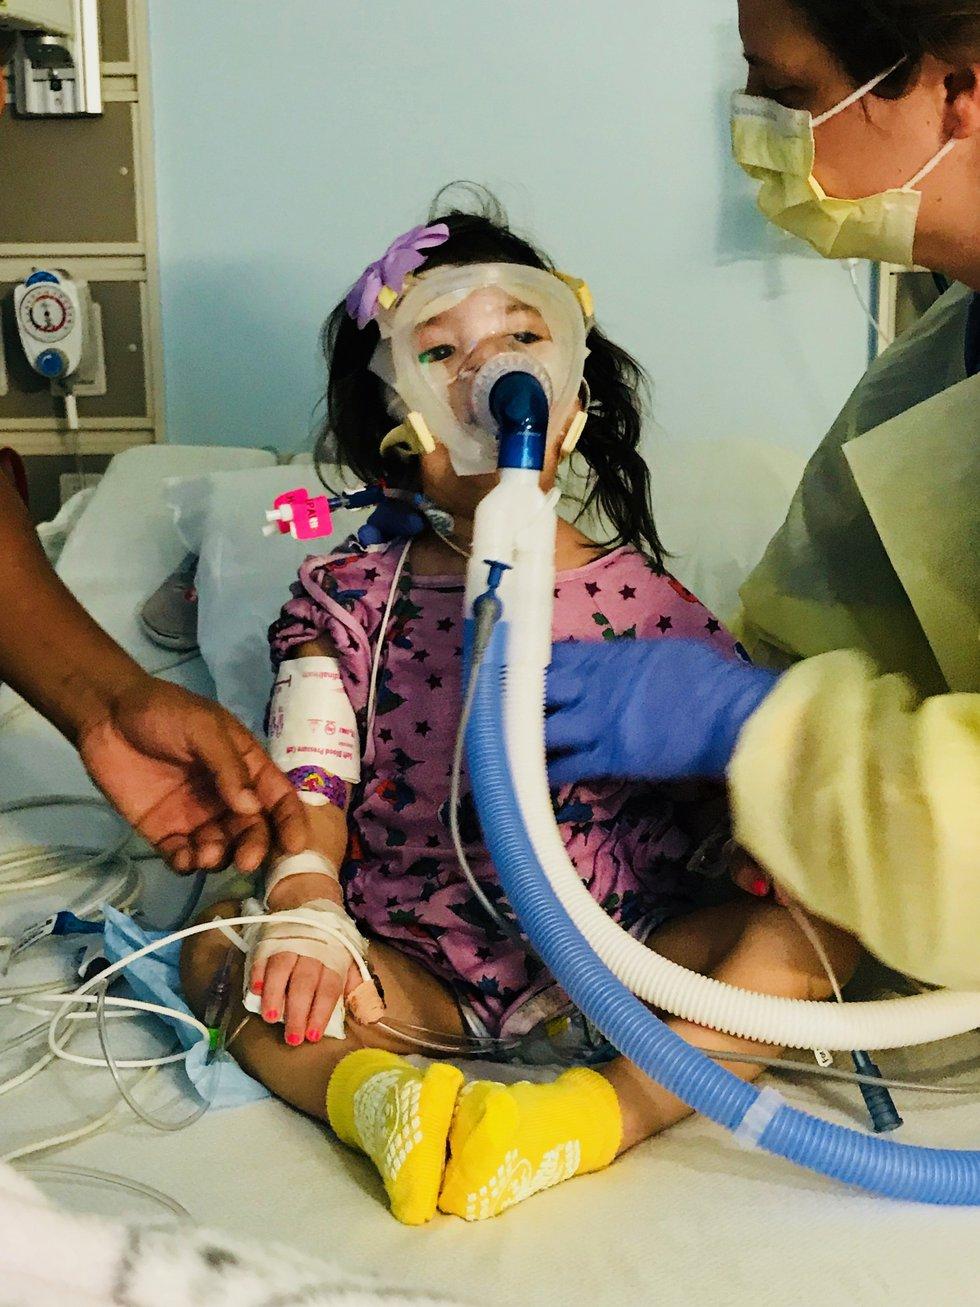 Abigail pictured on a ventilator, undergoing care in ICU at Children's Healthcare of Atlanta.